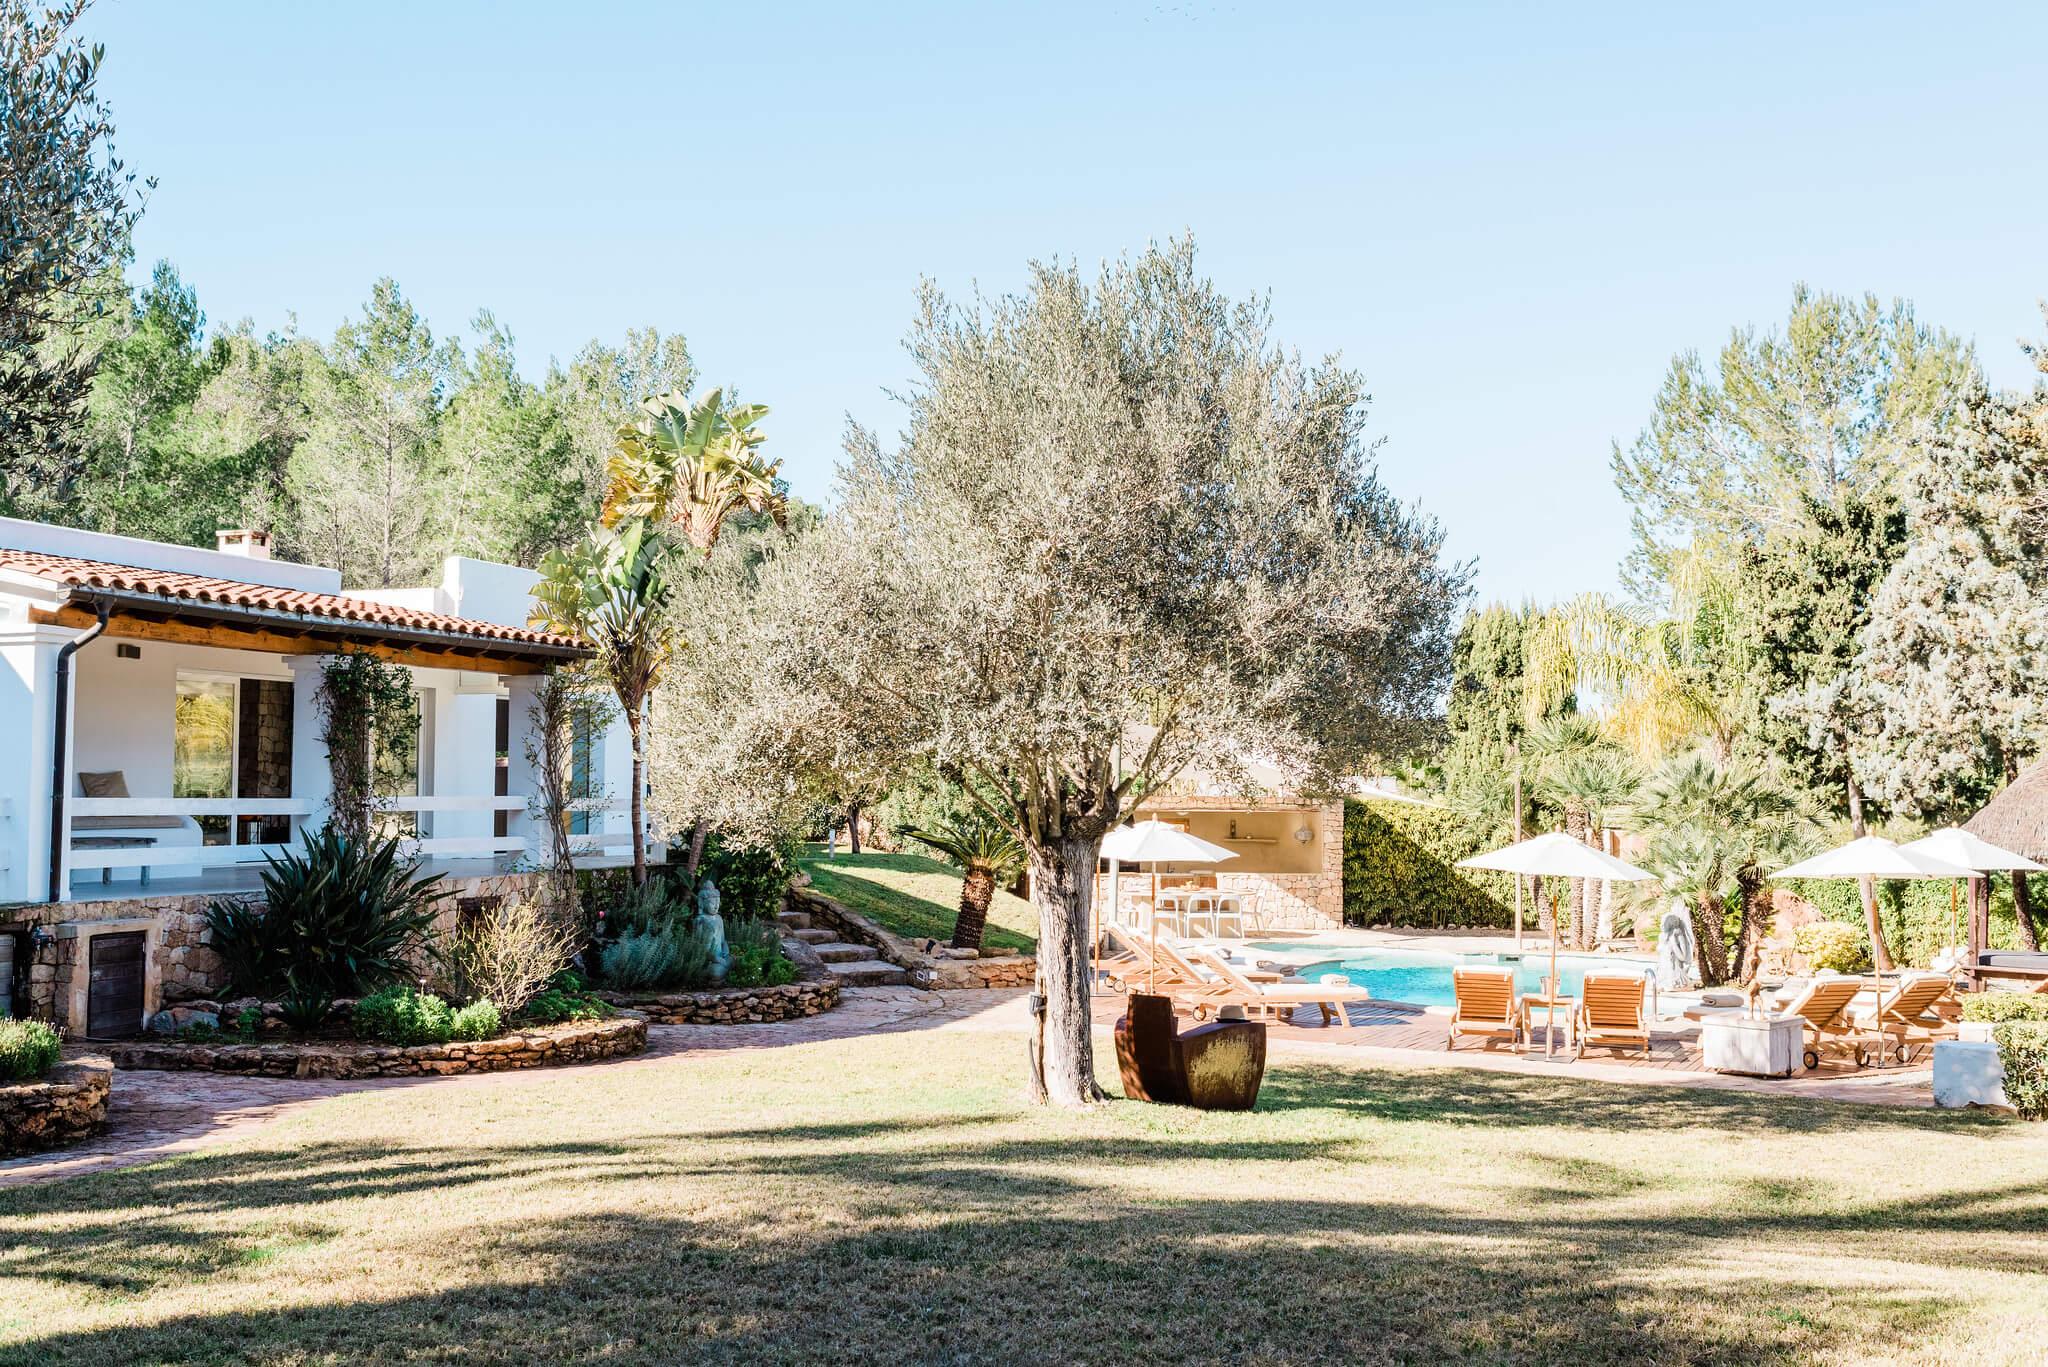 https://www.white-ibiza.com/wp-content/uploads/2020/05/white-ibiza-villas-can-verde-exterior-lawn.jpg